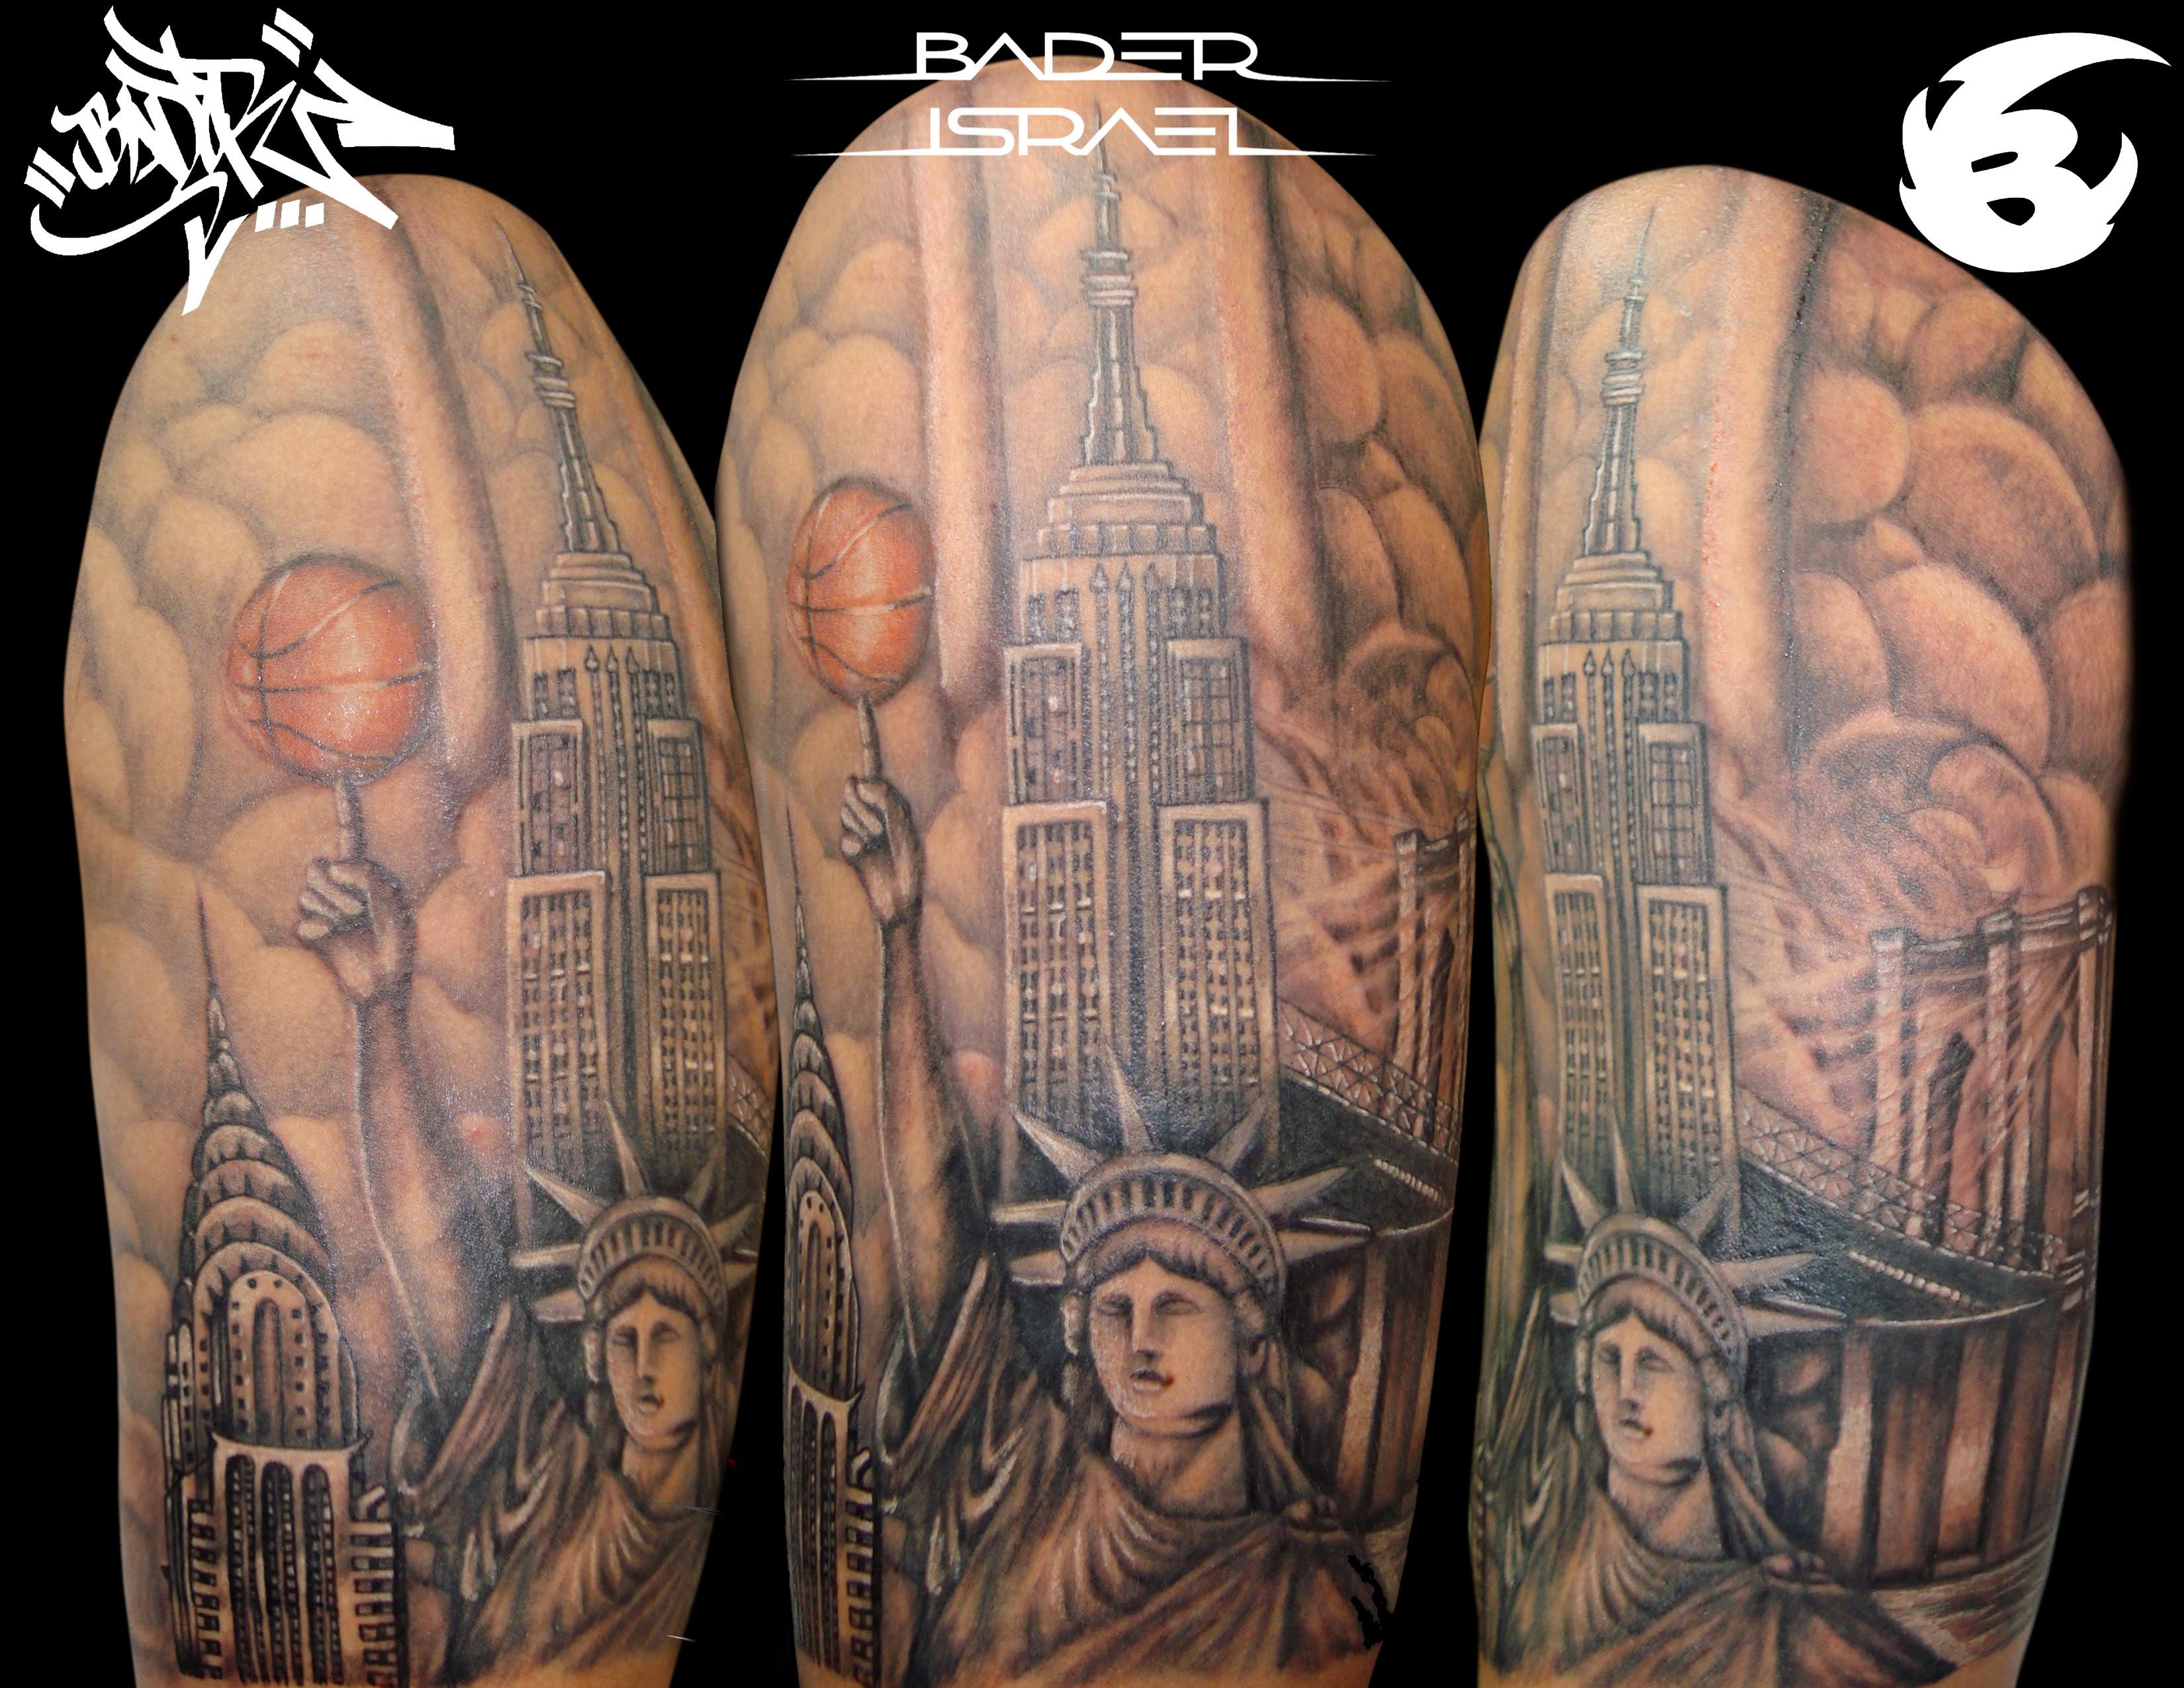 New York Tattoo Style By Badder Israel Badder